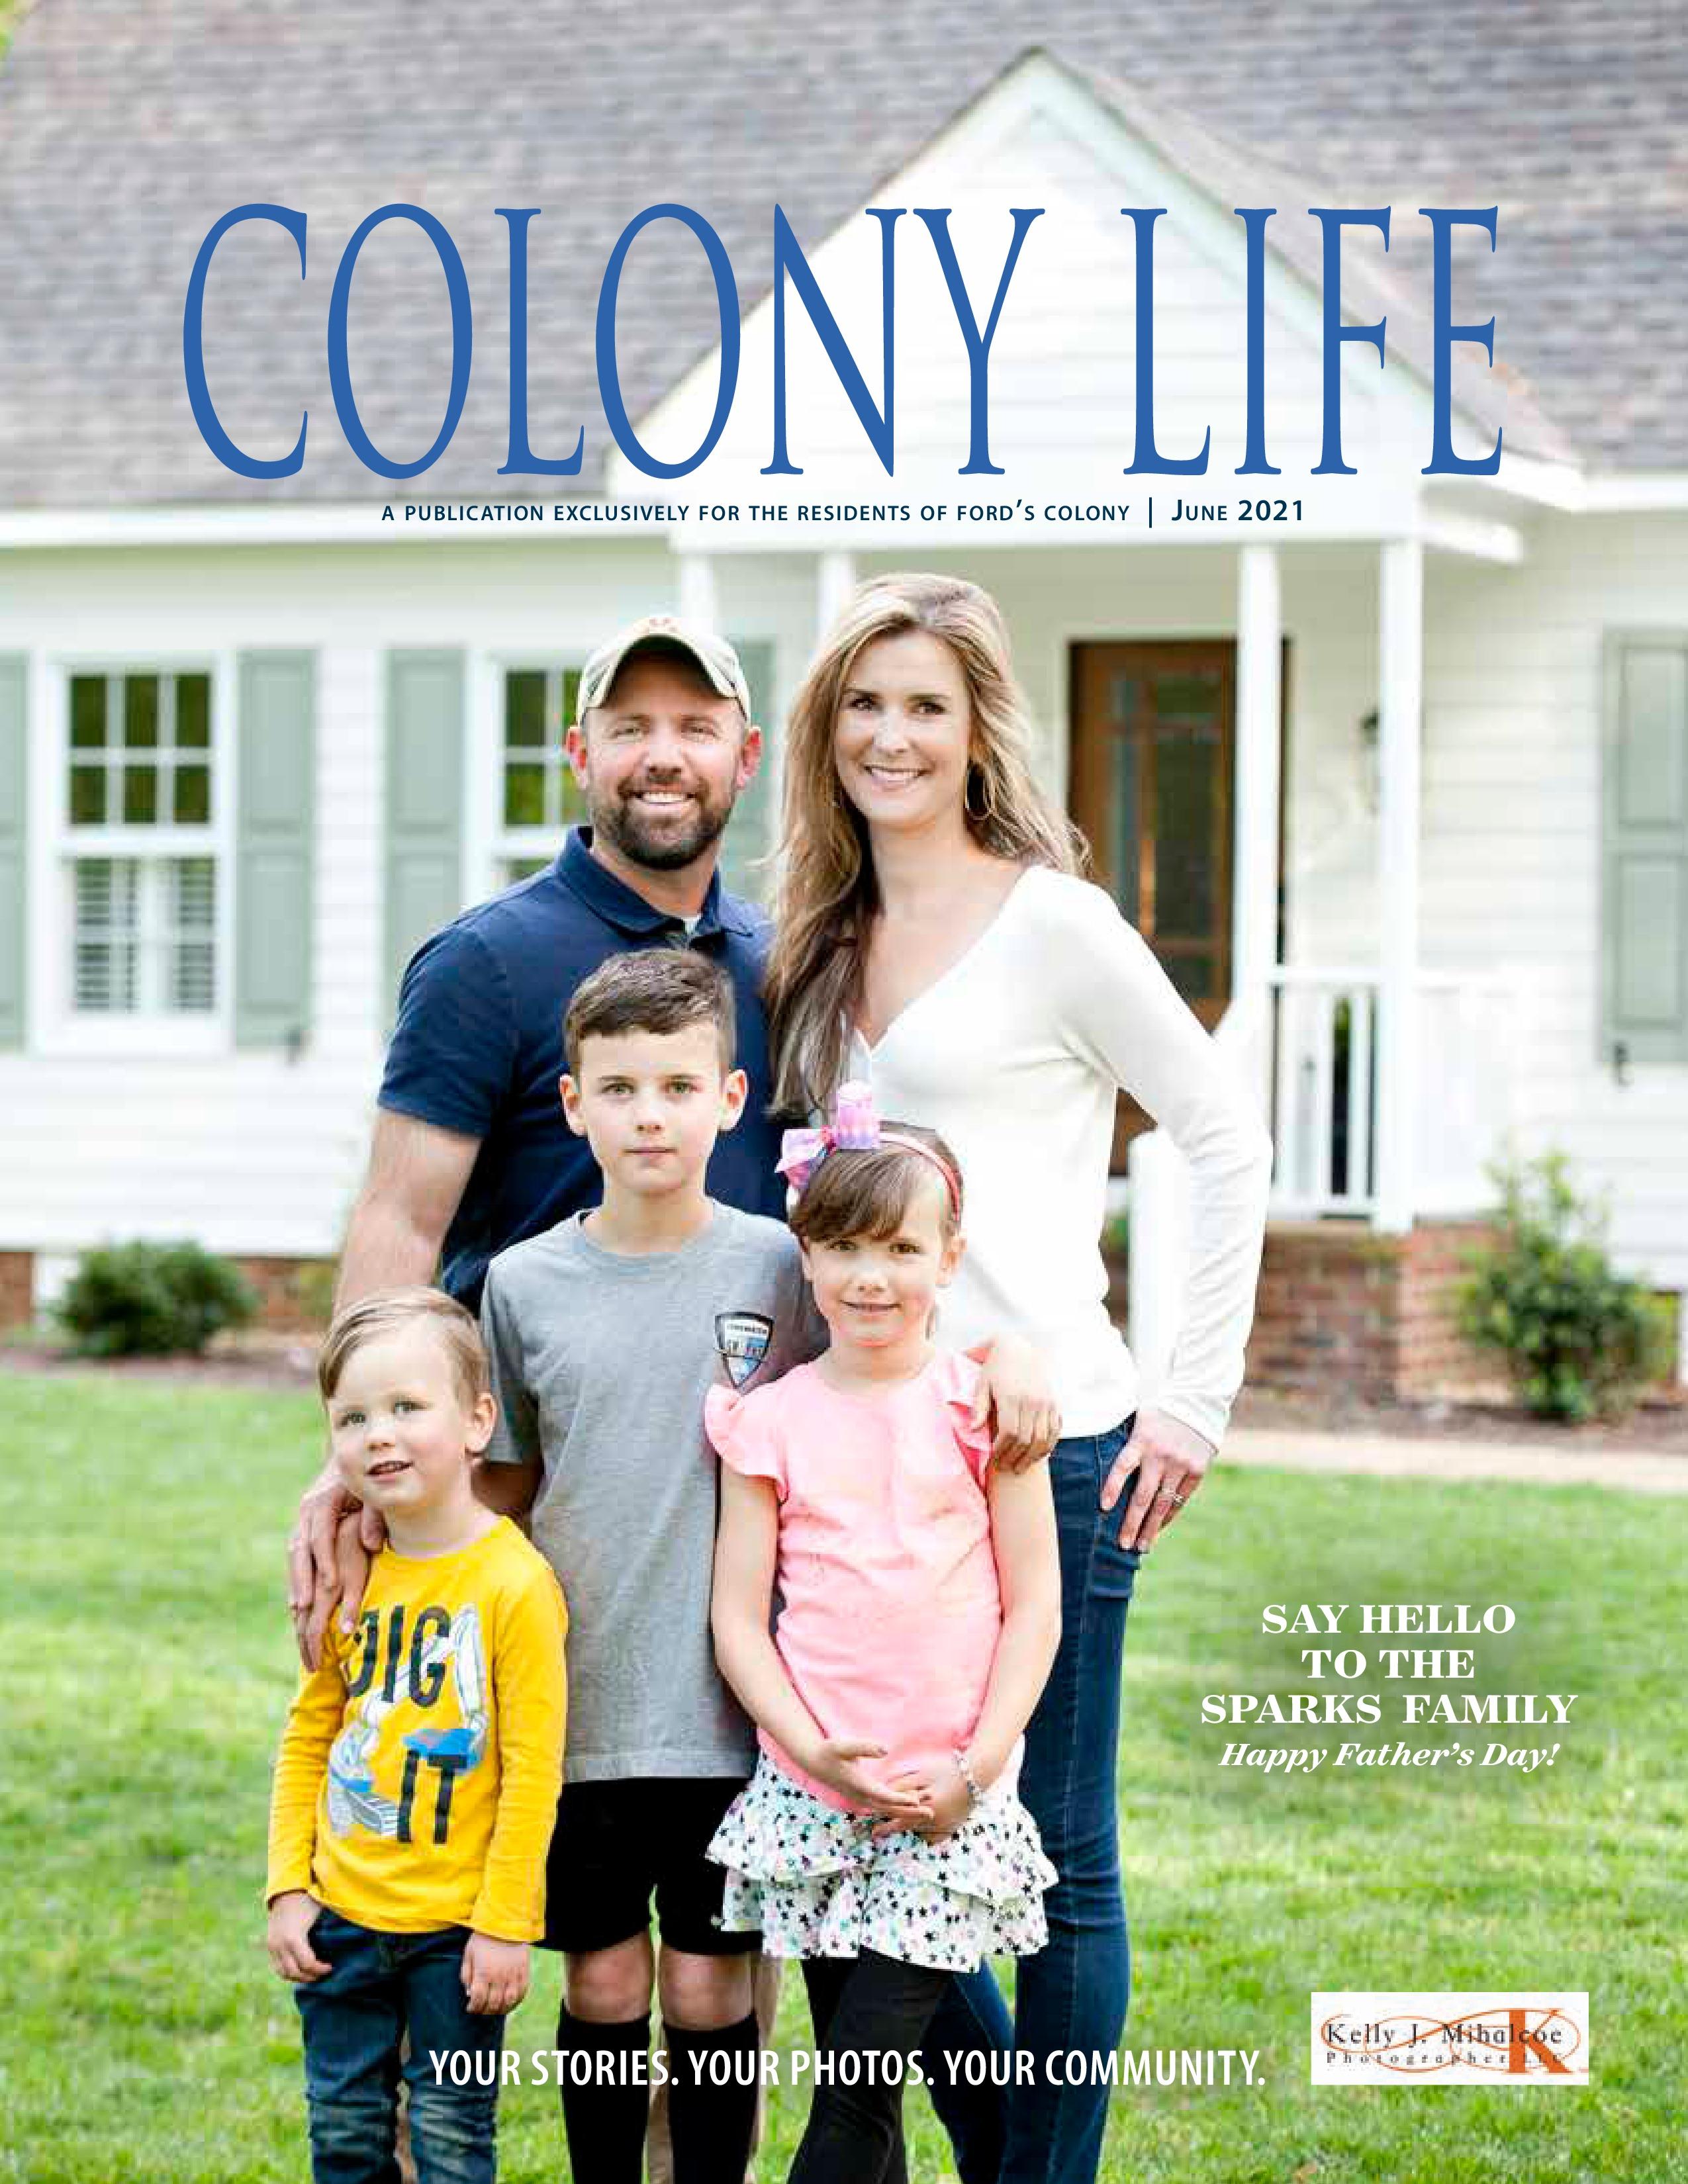 Colony Life 2021-06-01